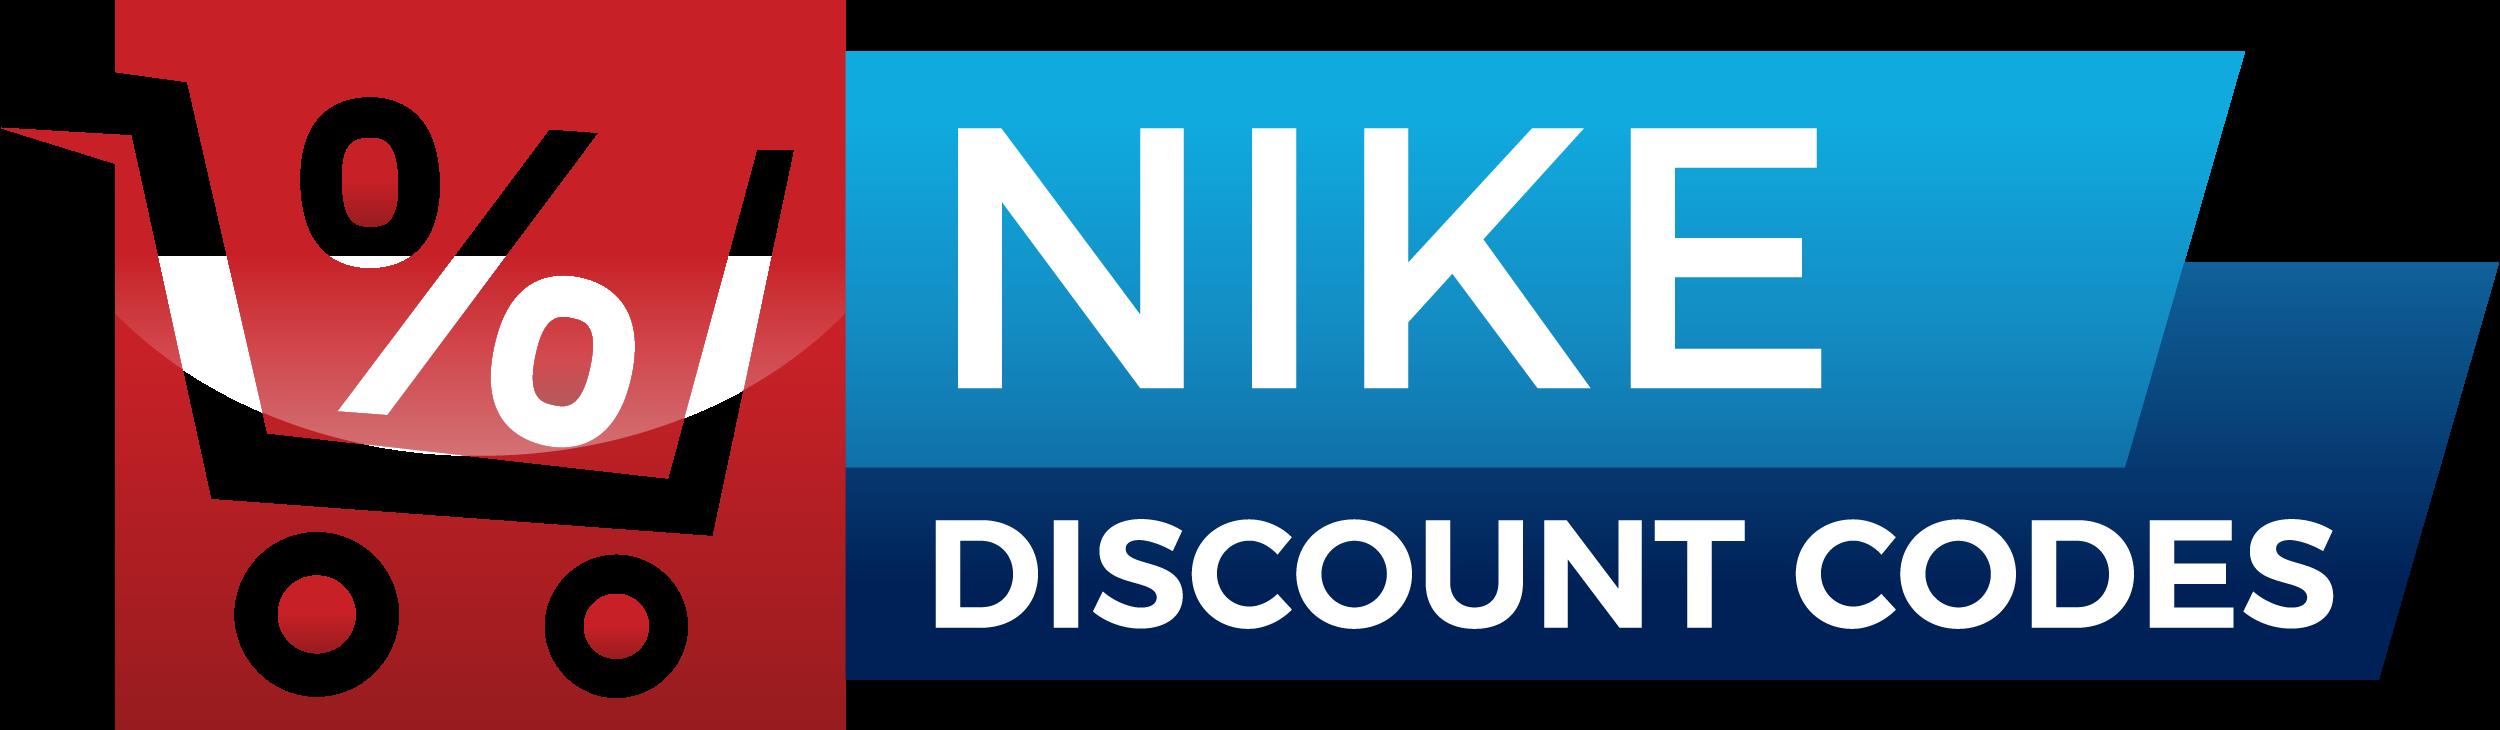 Nike Discount Codes Logo